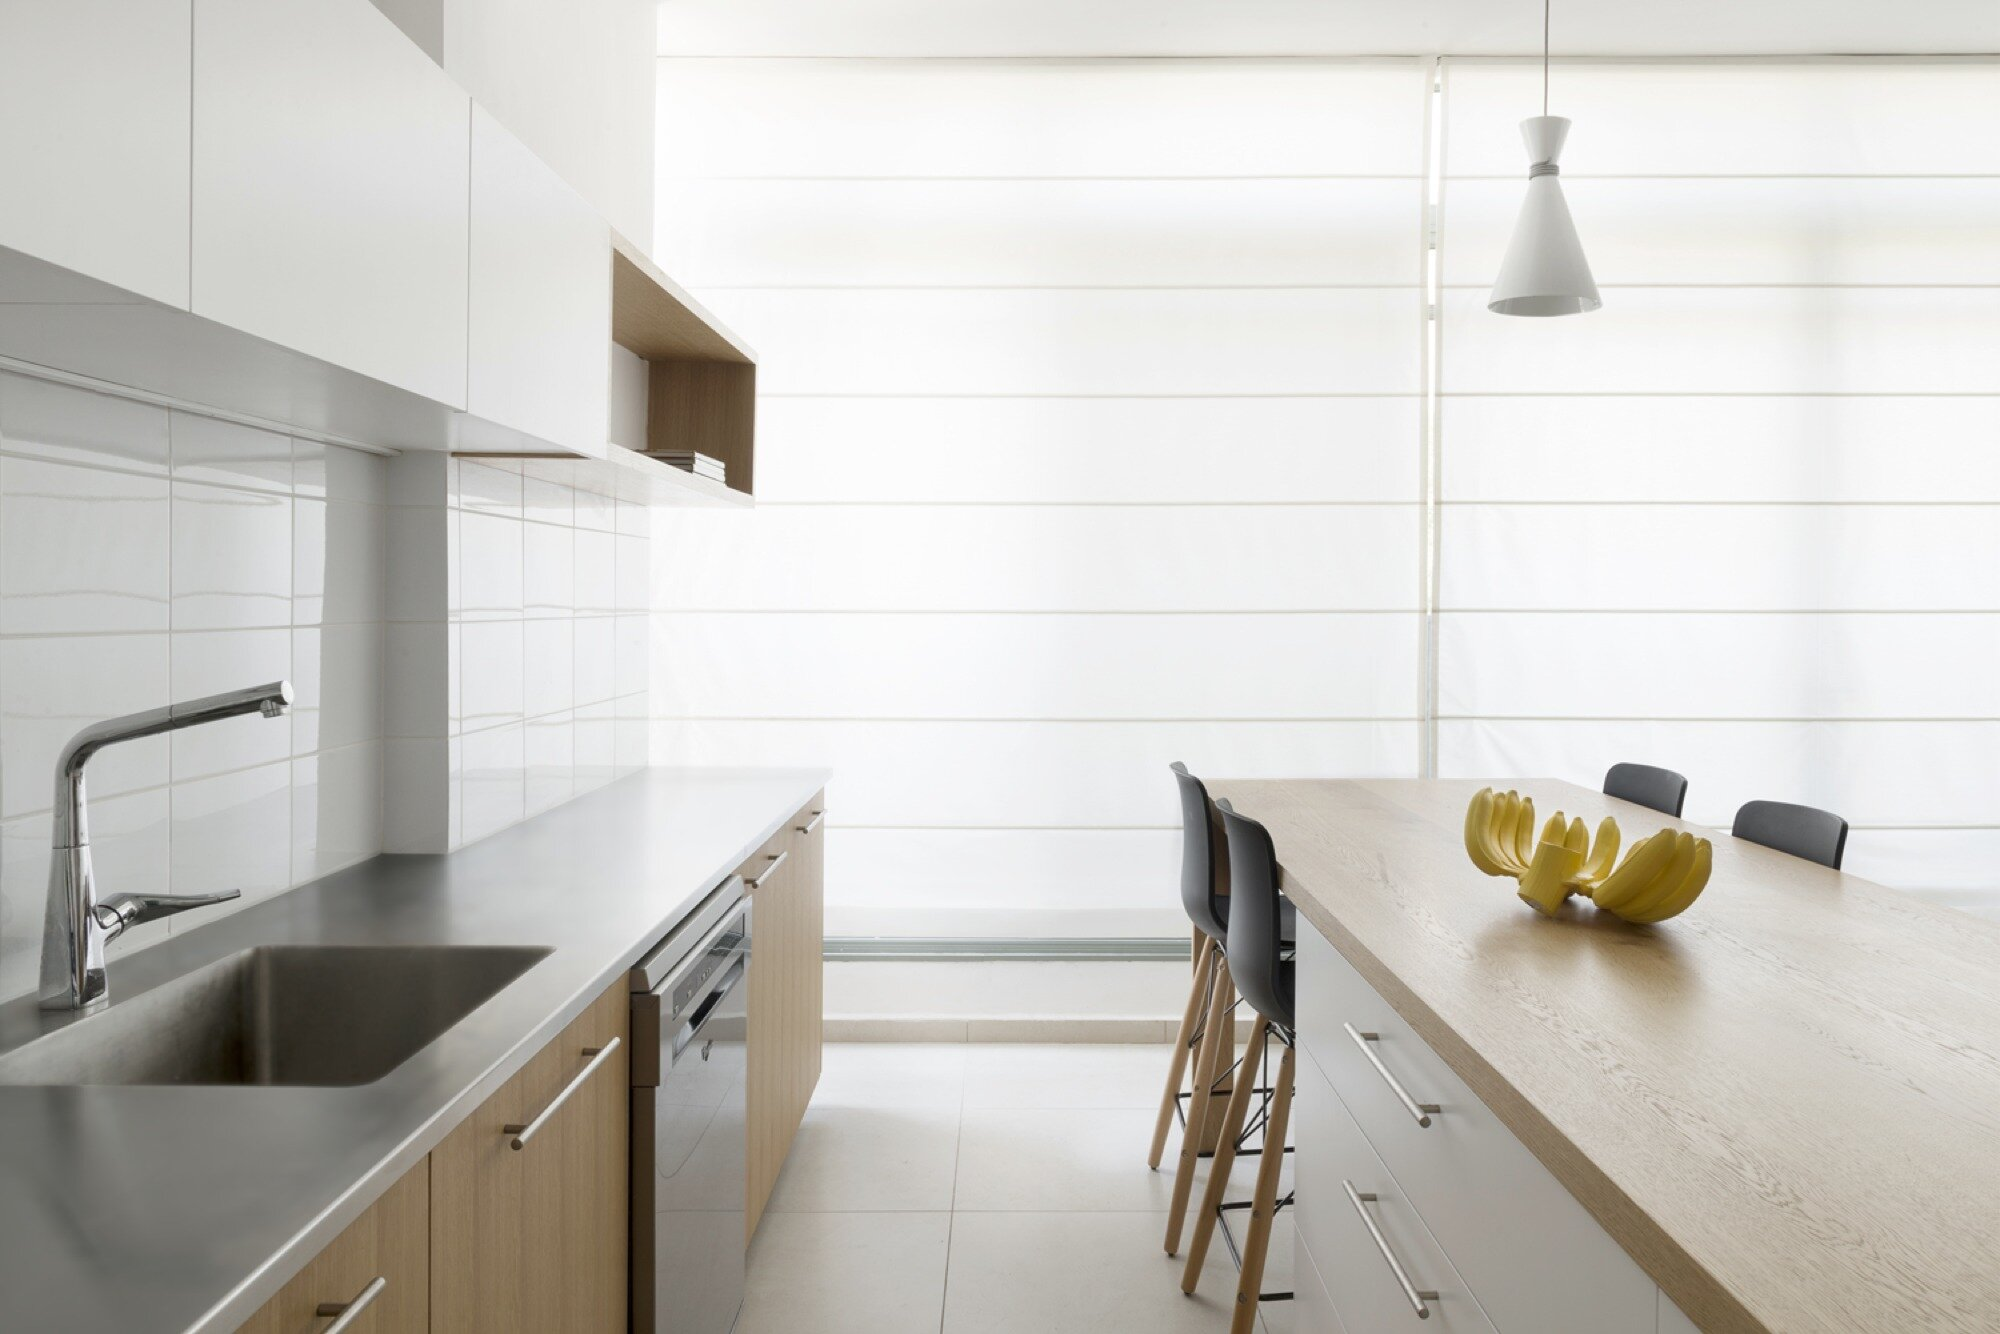 Apartment in Ramat Gan - Itai Palti - Israel - Kitchen Blinds Closed - Humble Homes